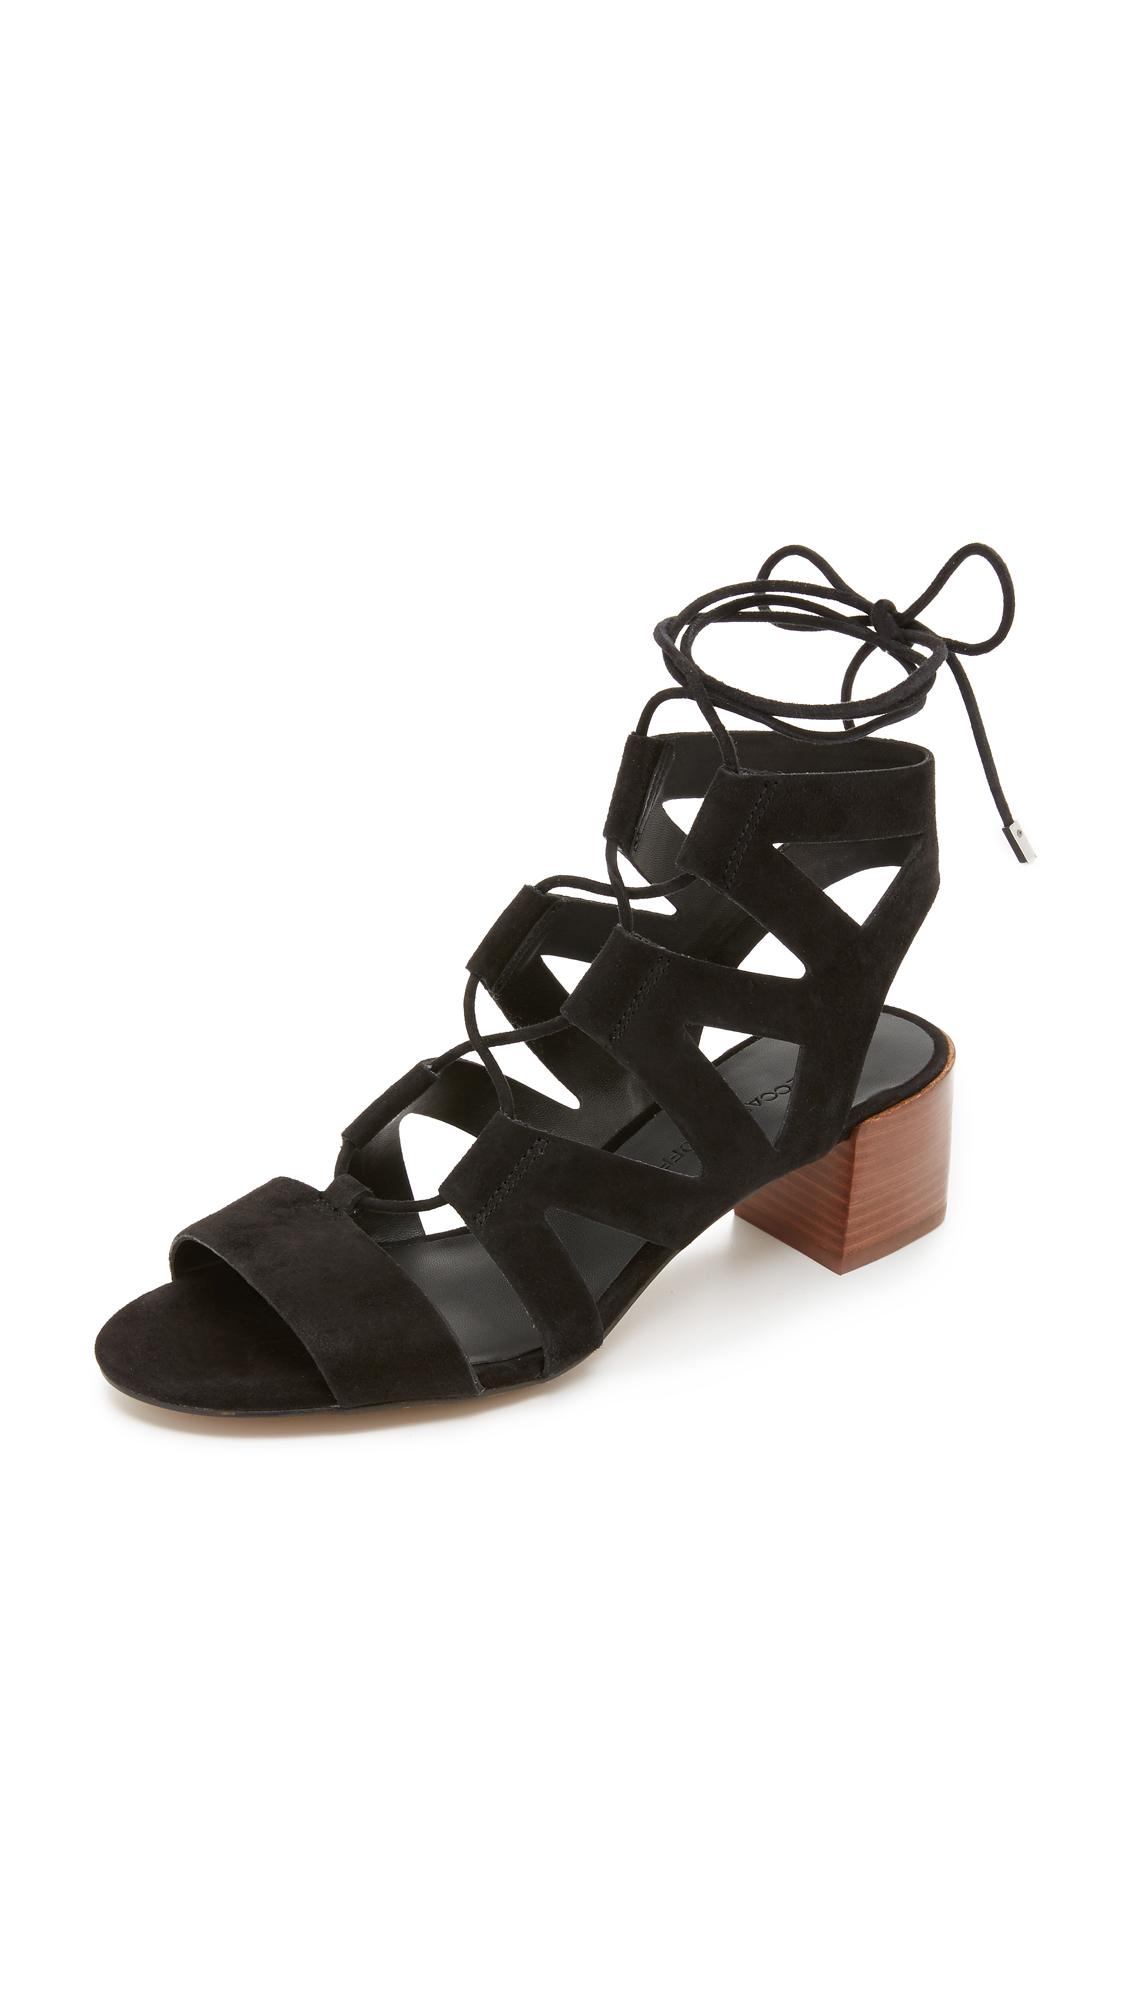 e923845bf050 Rebecca Minkoff Issa Gladiator Sandals